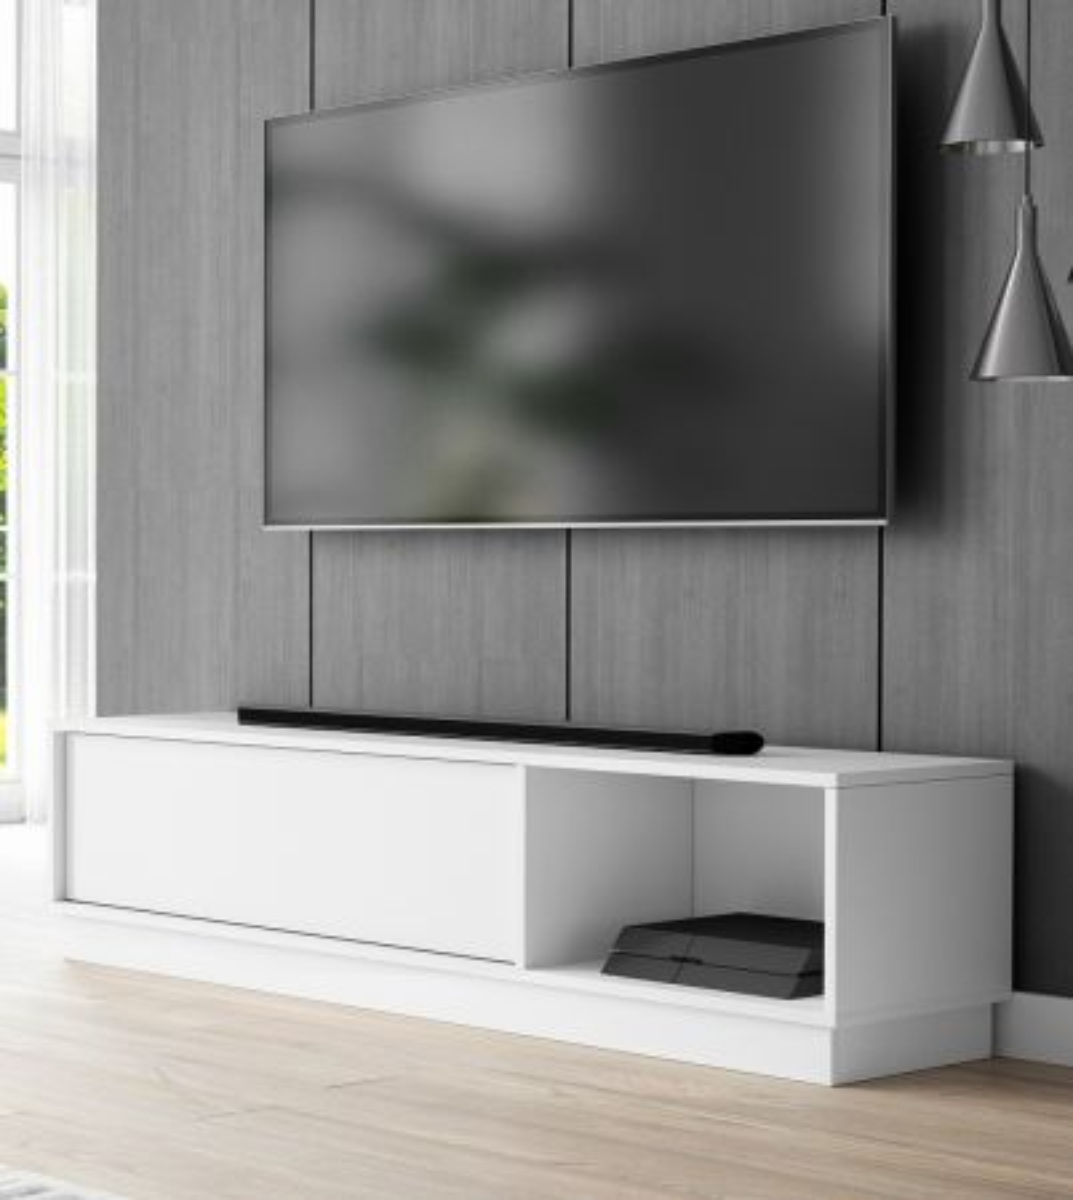 TV-Lowboard Stream in weiss 140 x 36 cm